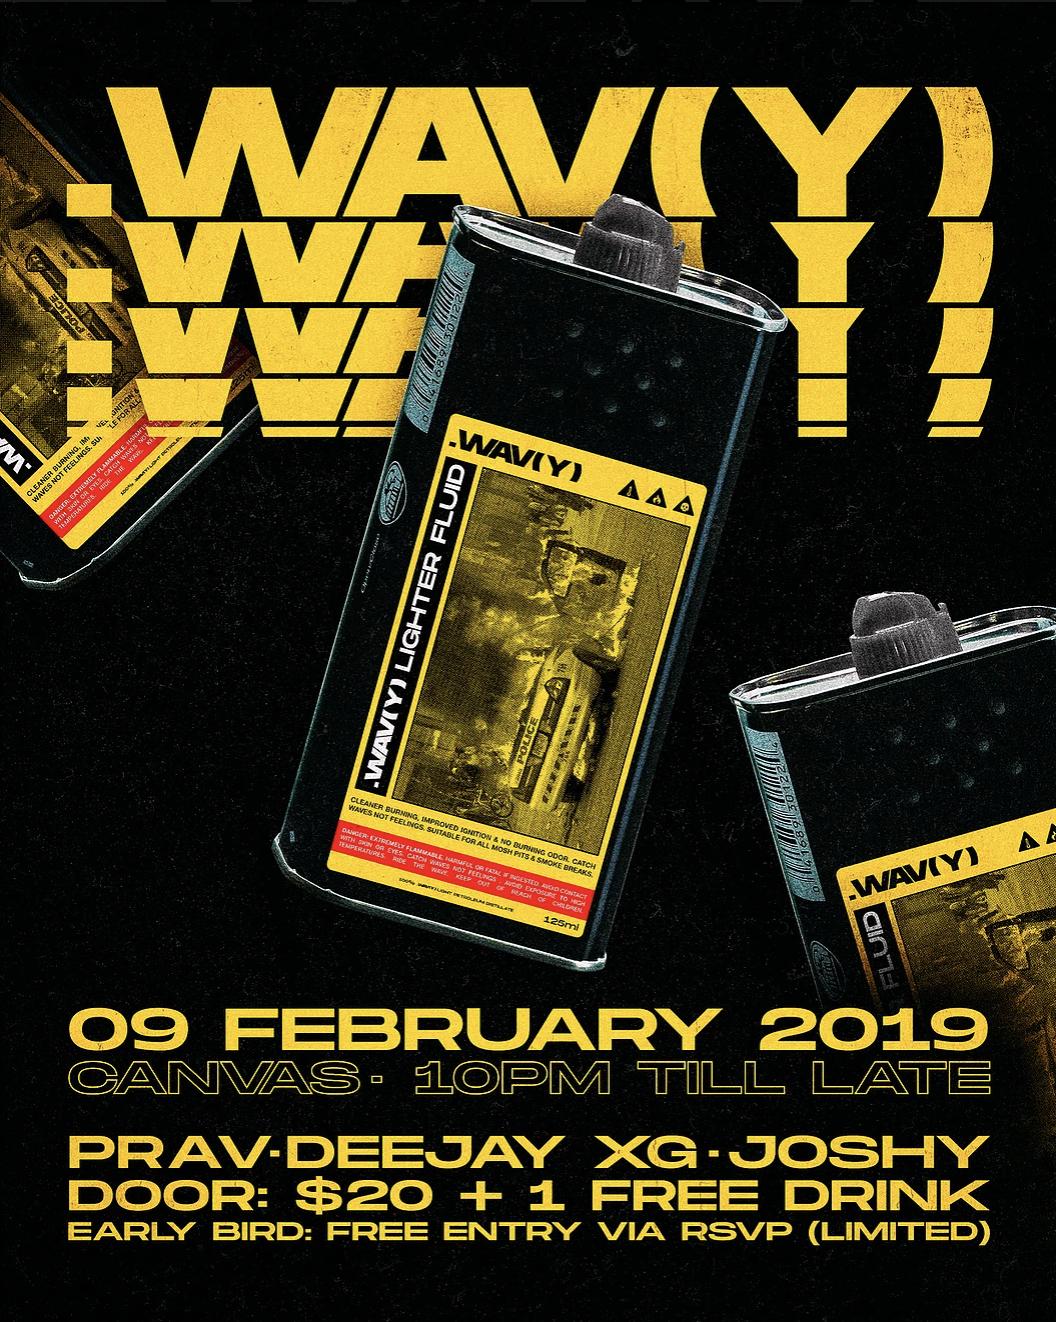 .WAV(Y) FEBRUARY 2019